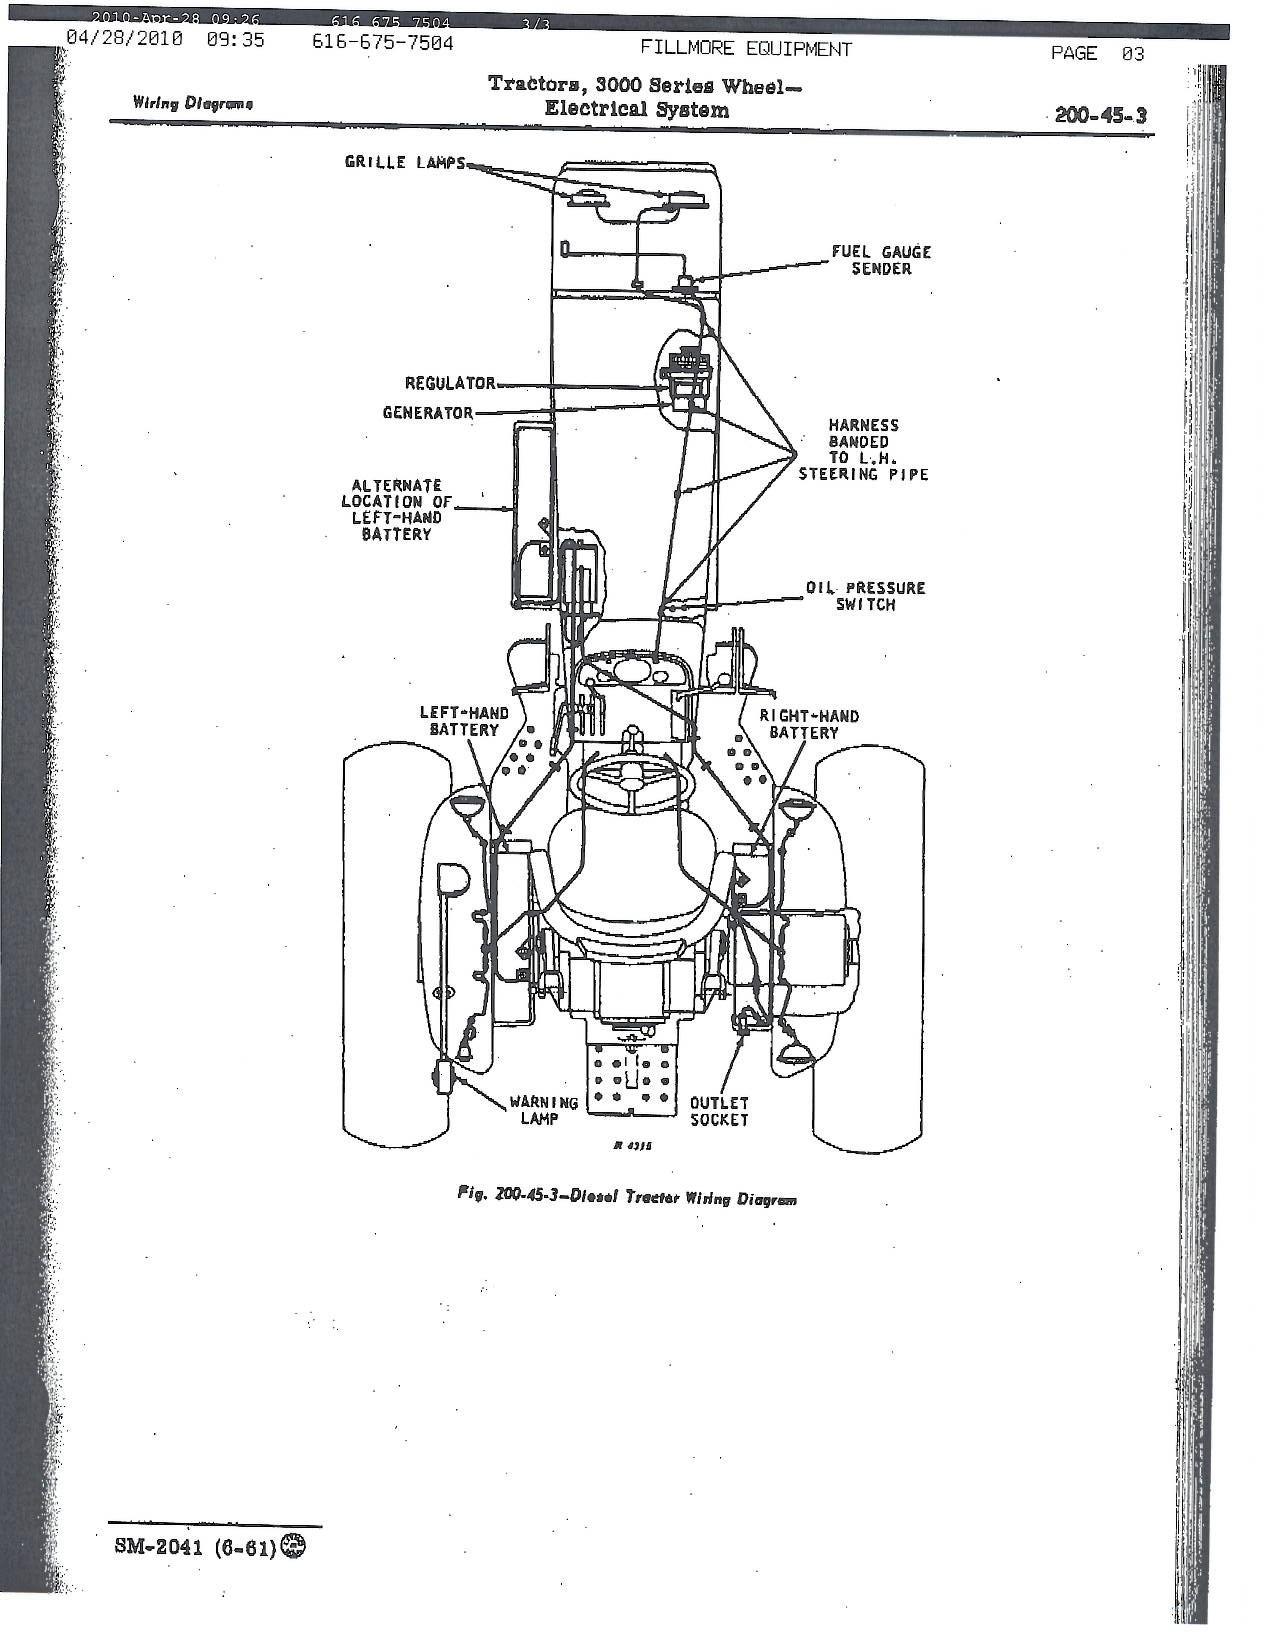 John Deere Gator Ignition Diagram 3da1518 Peg Perego Tractor Wiring Diagram Of John Deere Gator Ignition Diagram